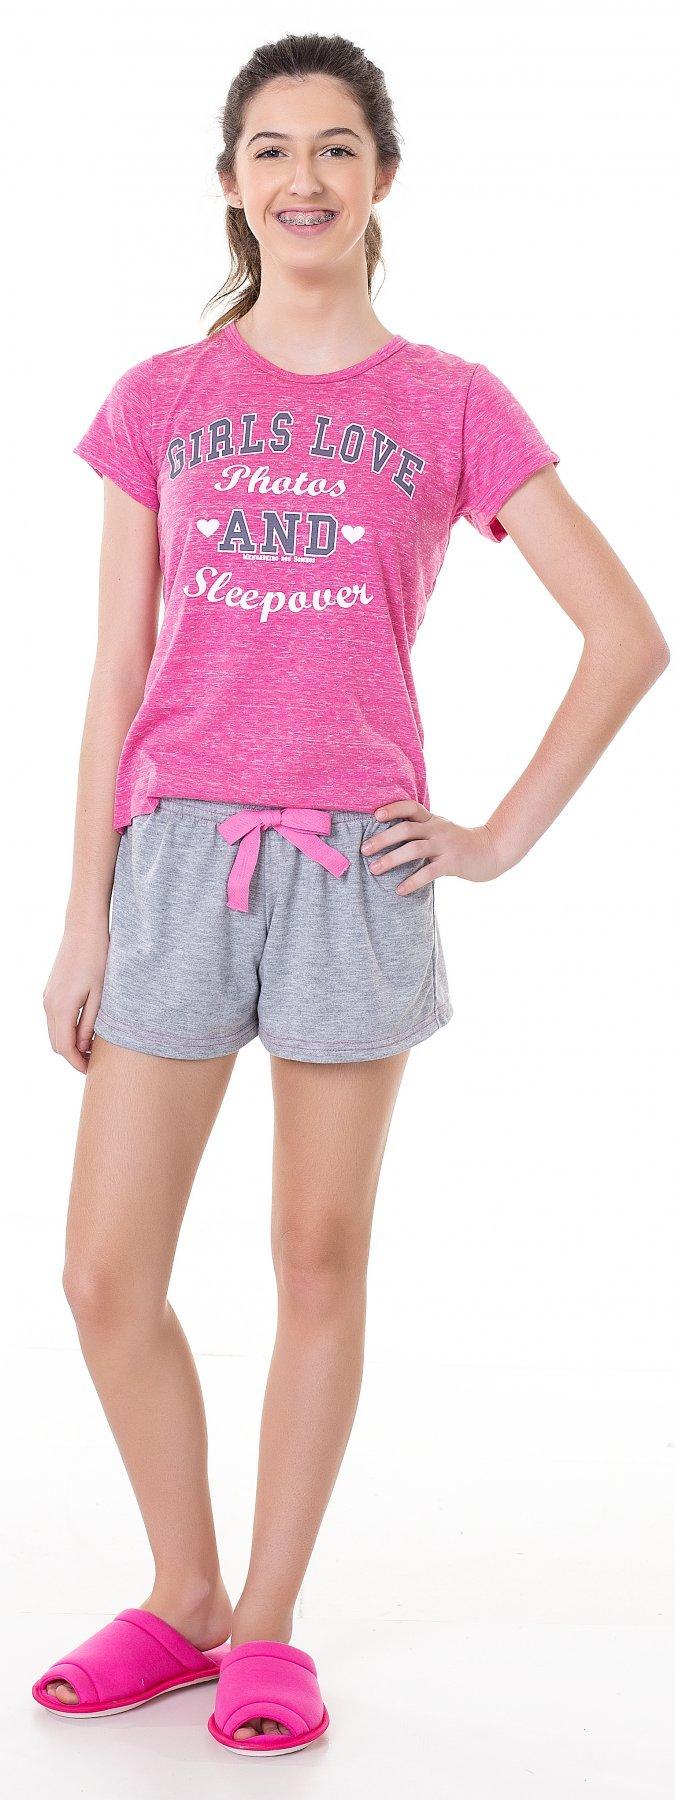 Pijama Juvenil College Girl Verão 2017